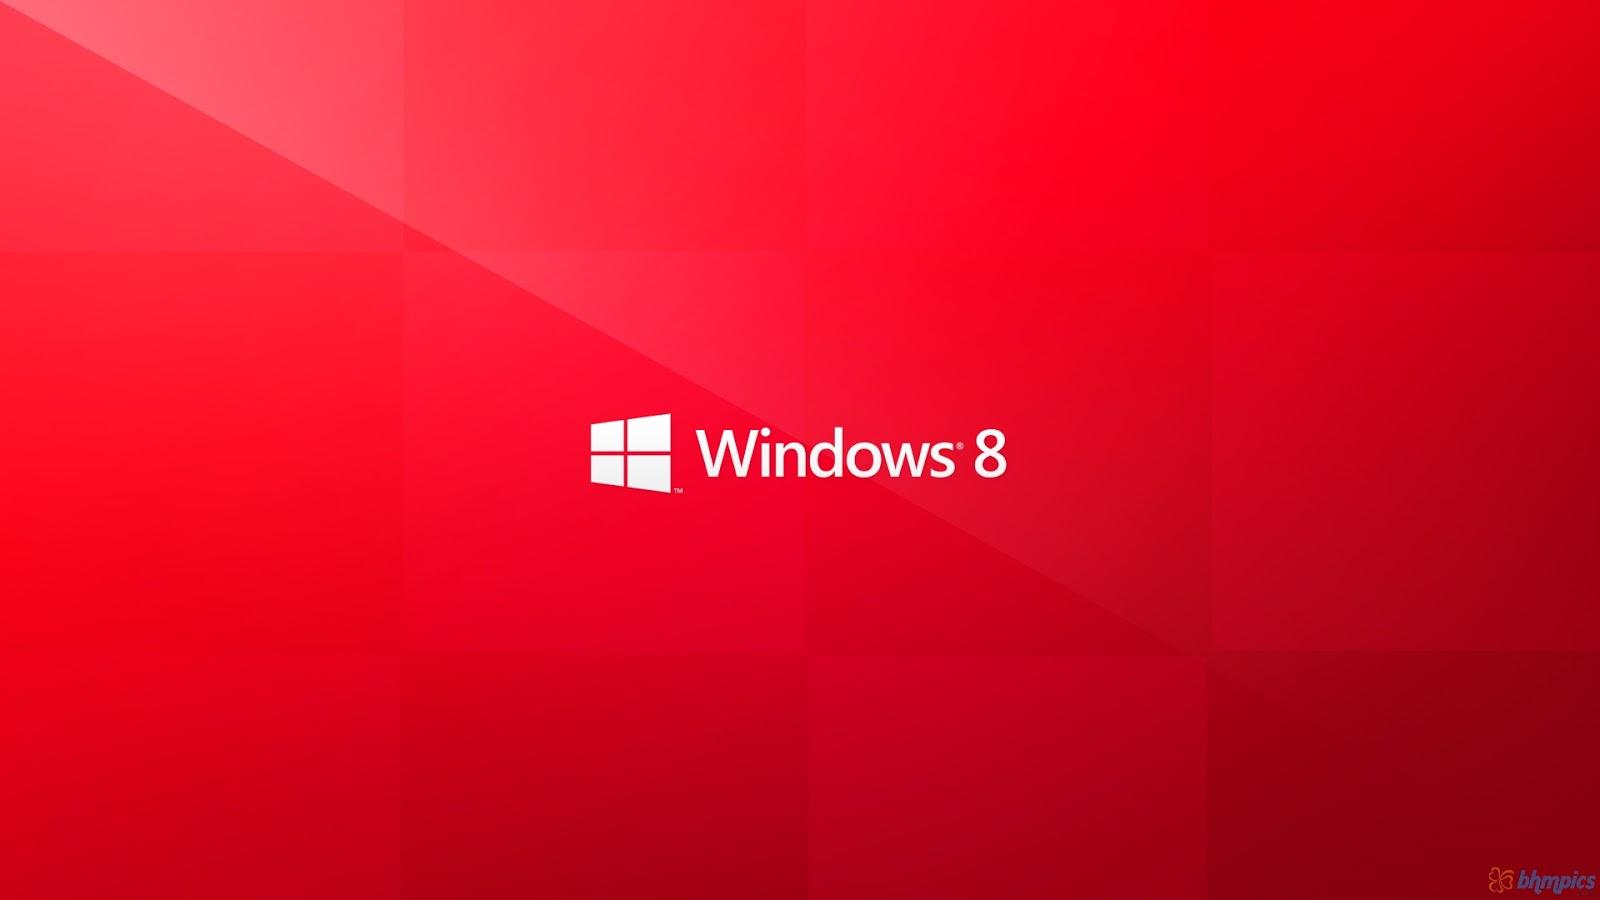 Red windows 10 wallpaper hd wallpapersafari - Windows 8 1 wallpaper hd nature ...